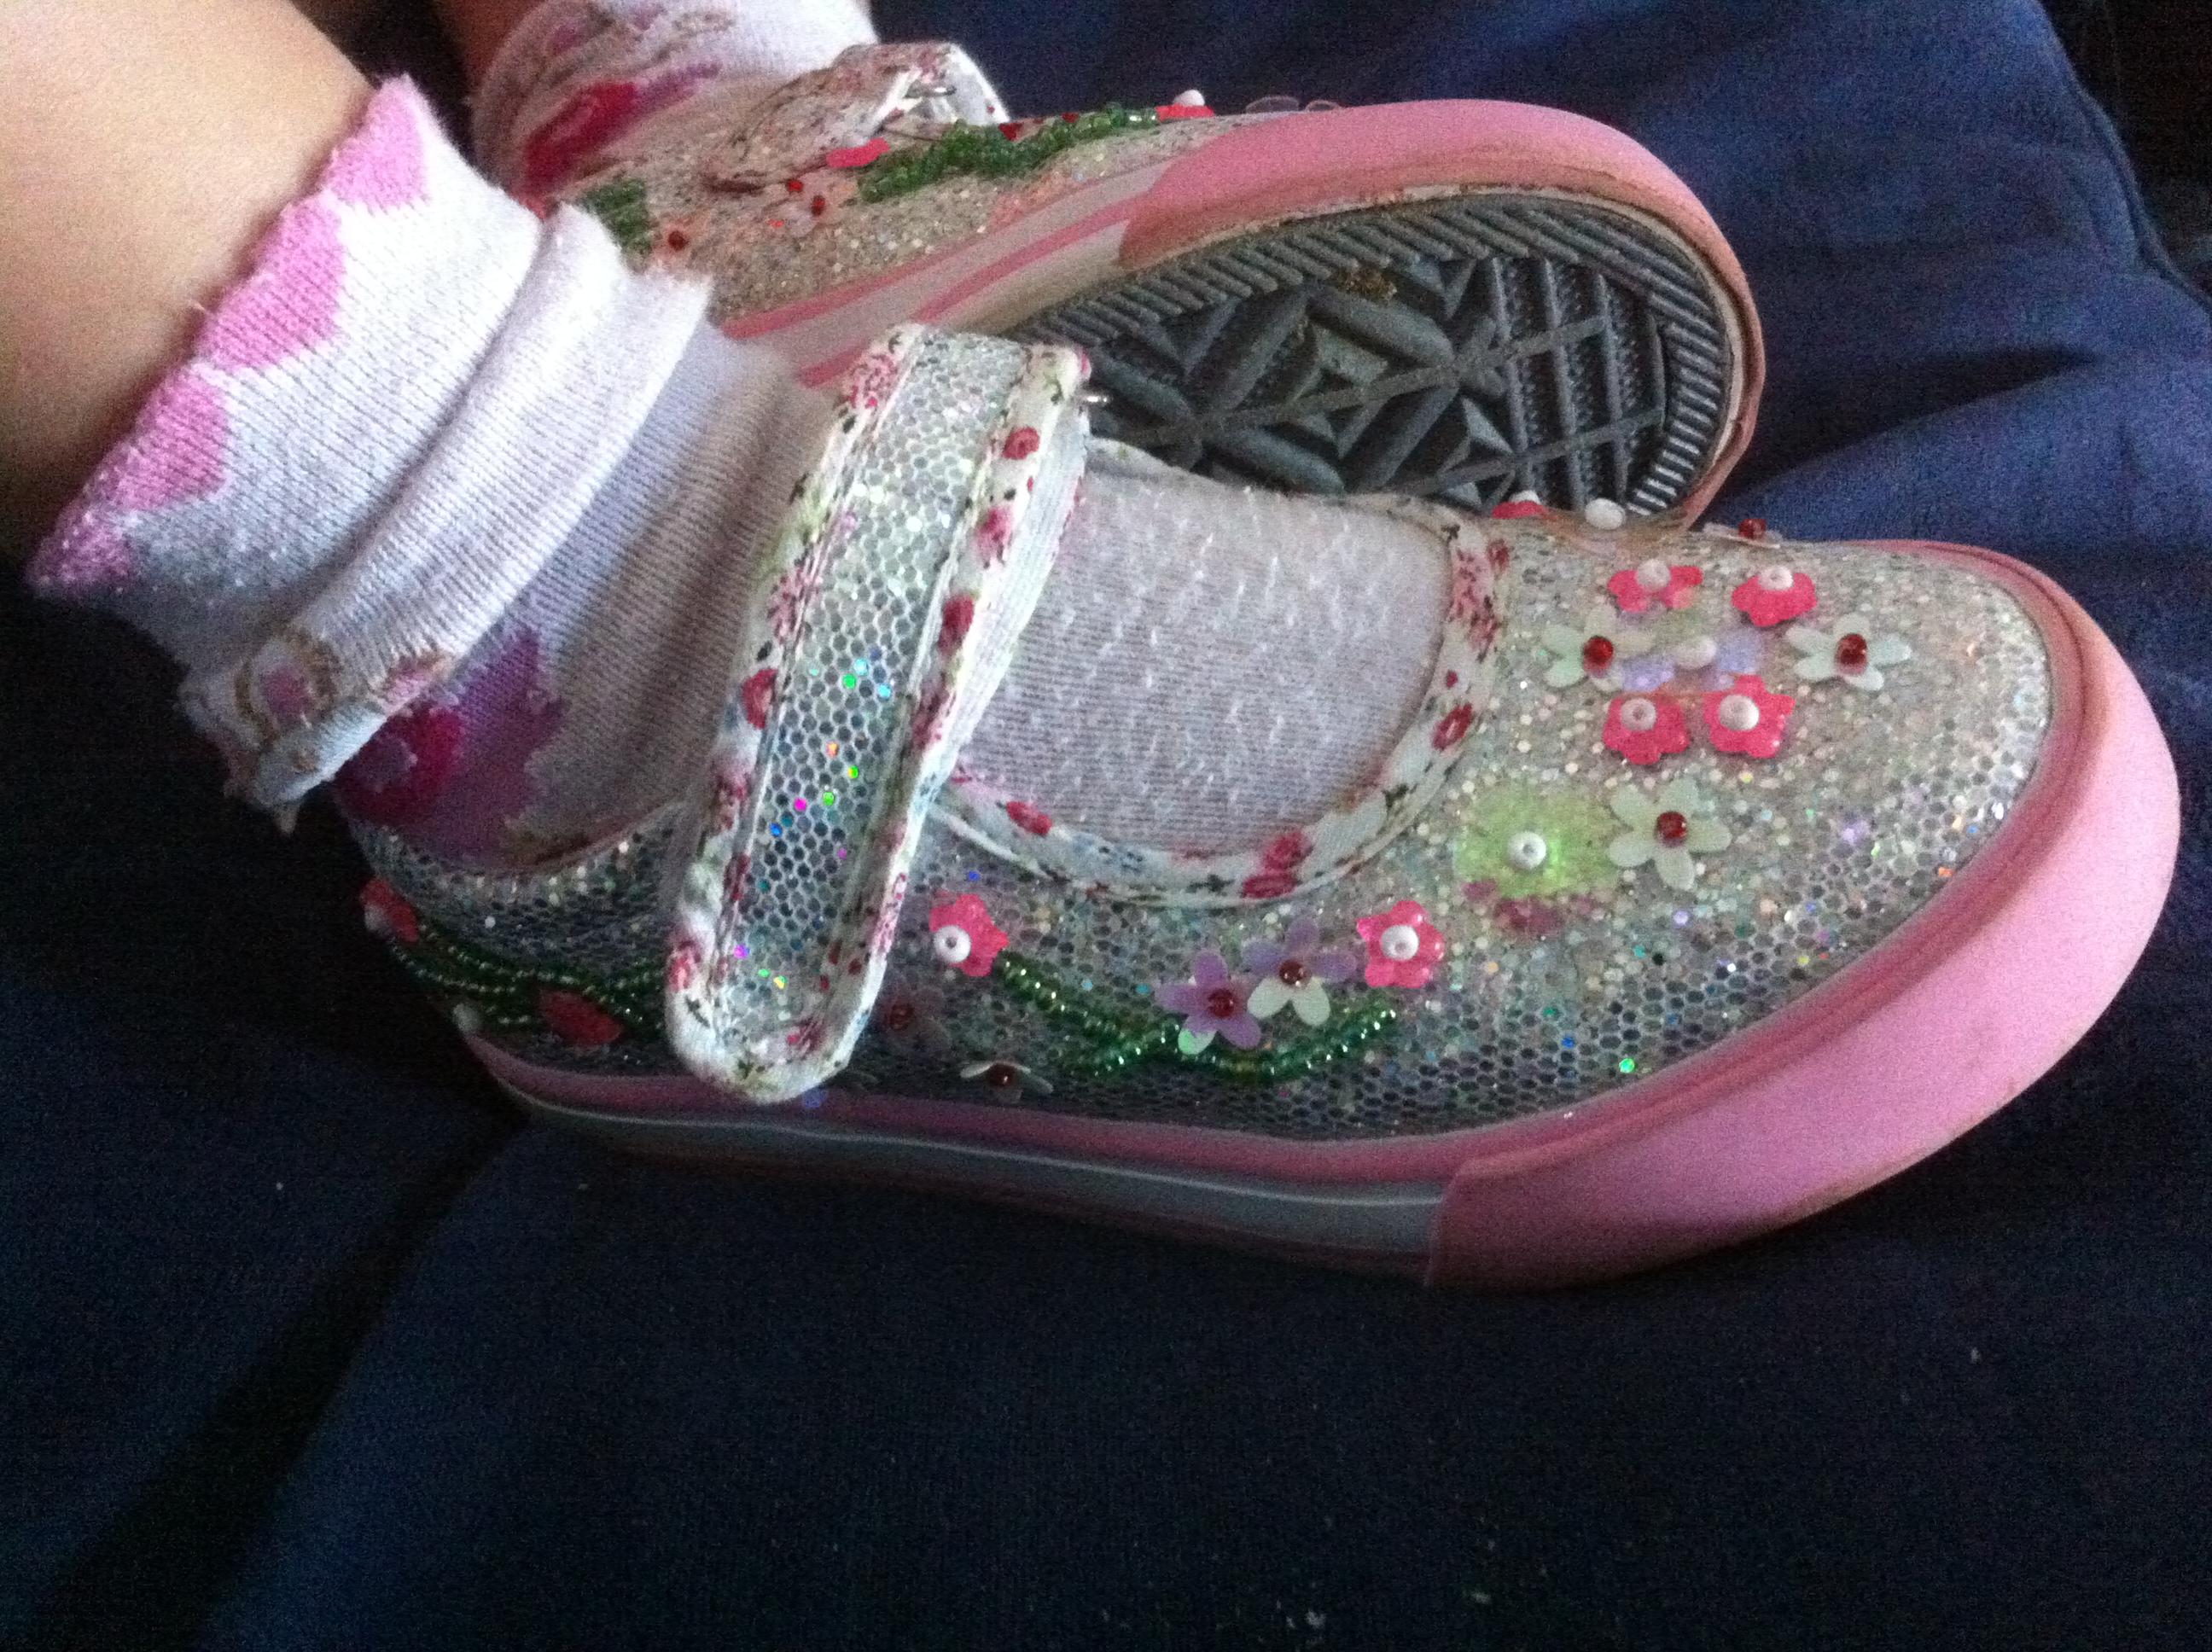 Aldi's Summer Lelli Kelly Styled Shoes